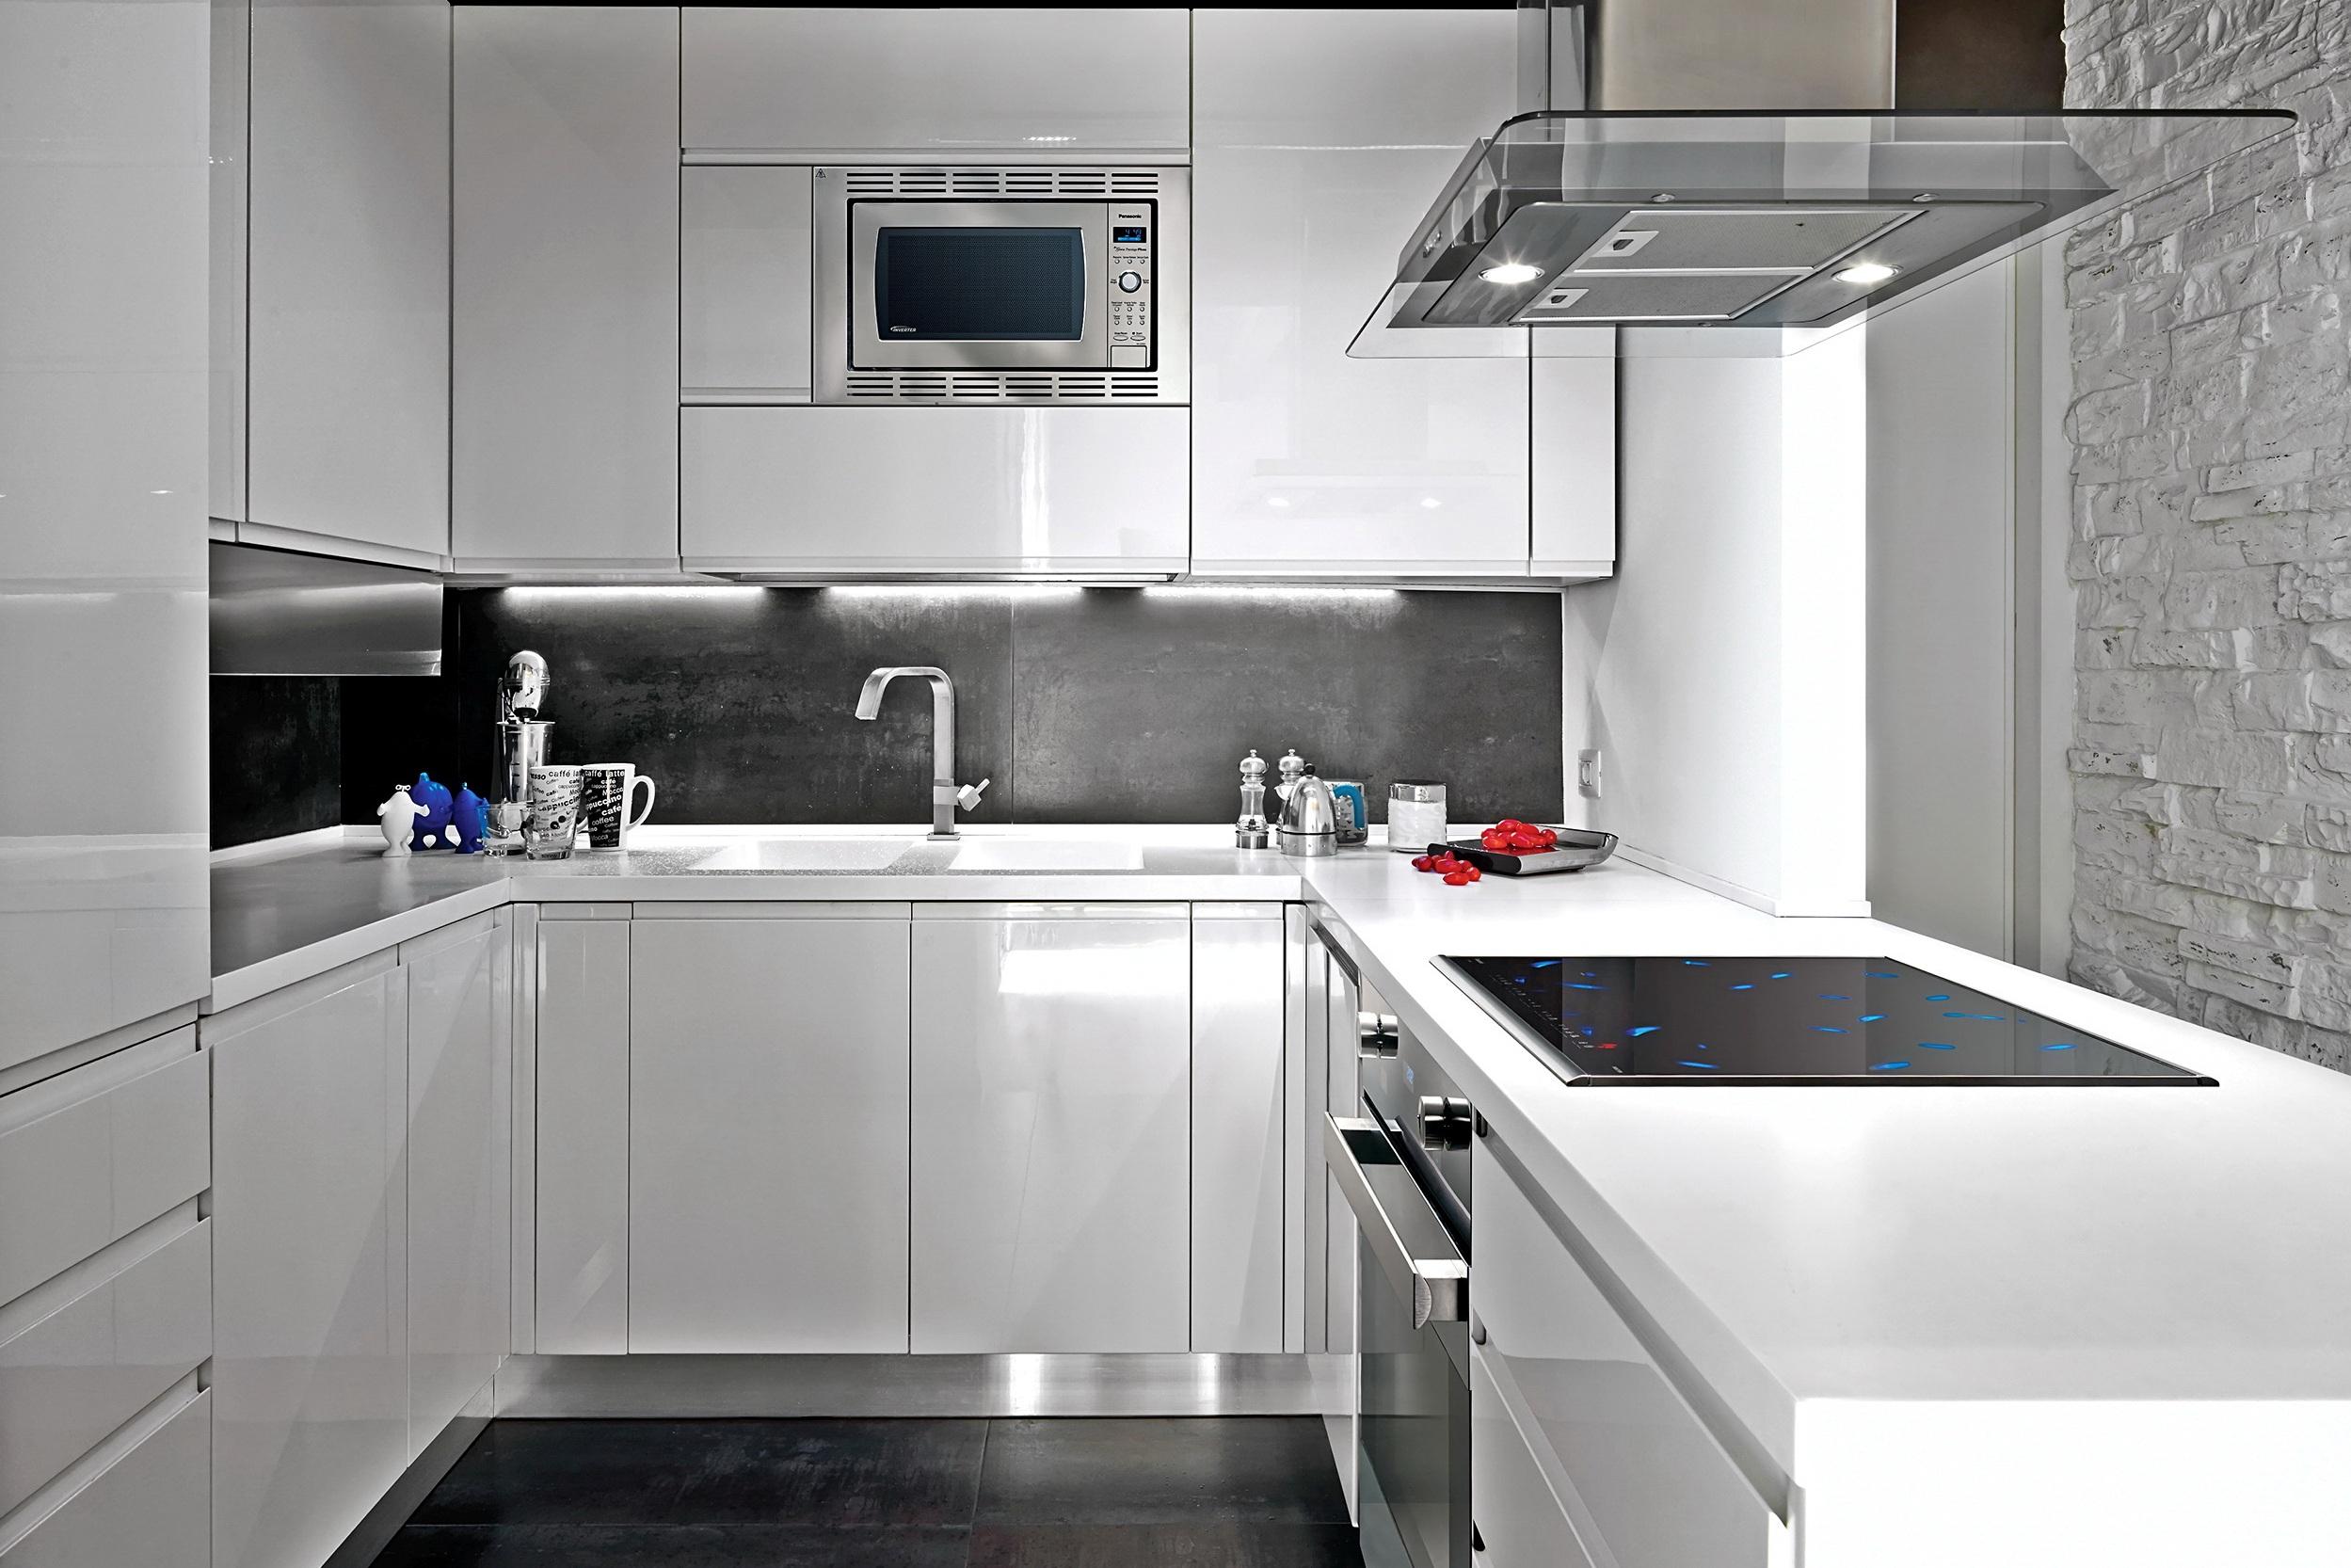 Белая глянцевая кухня в стиле хай-тек